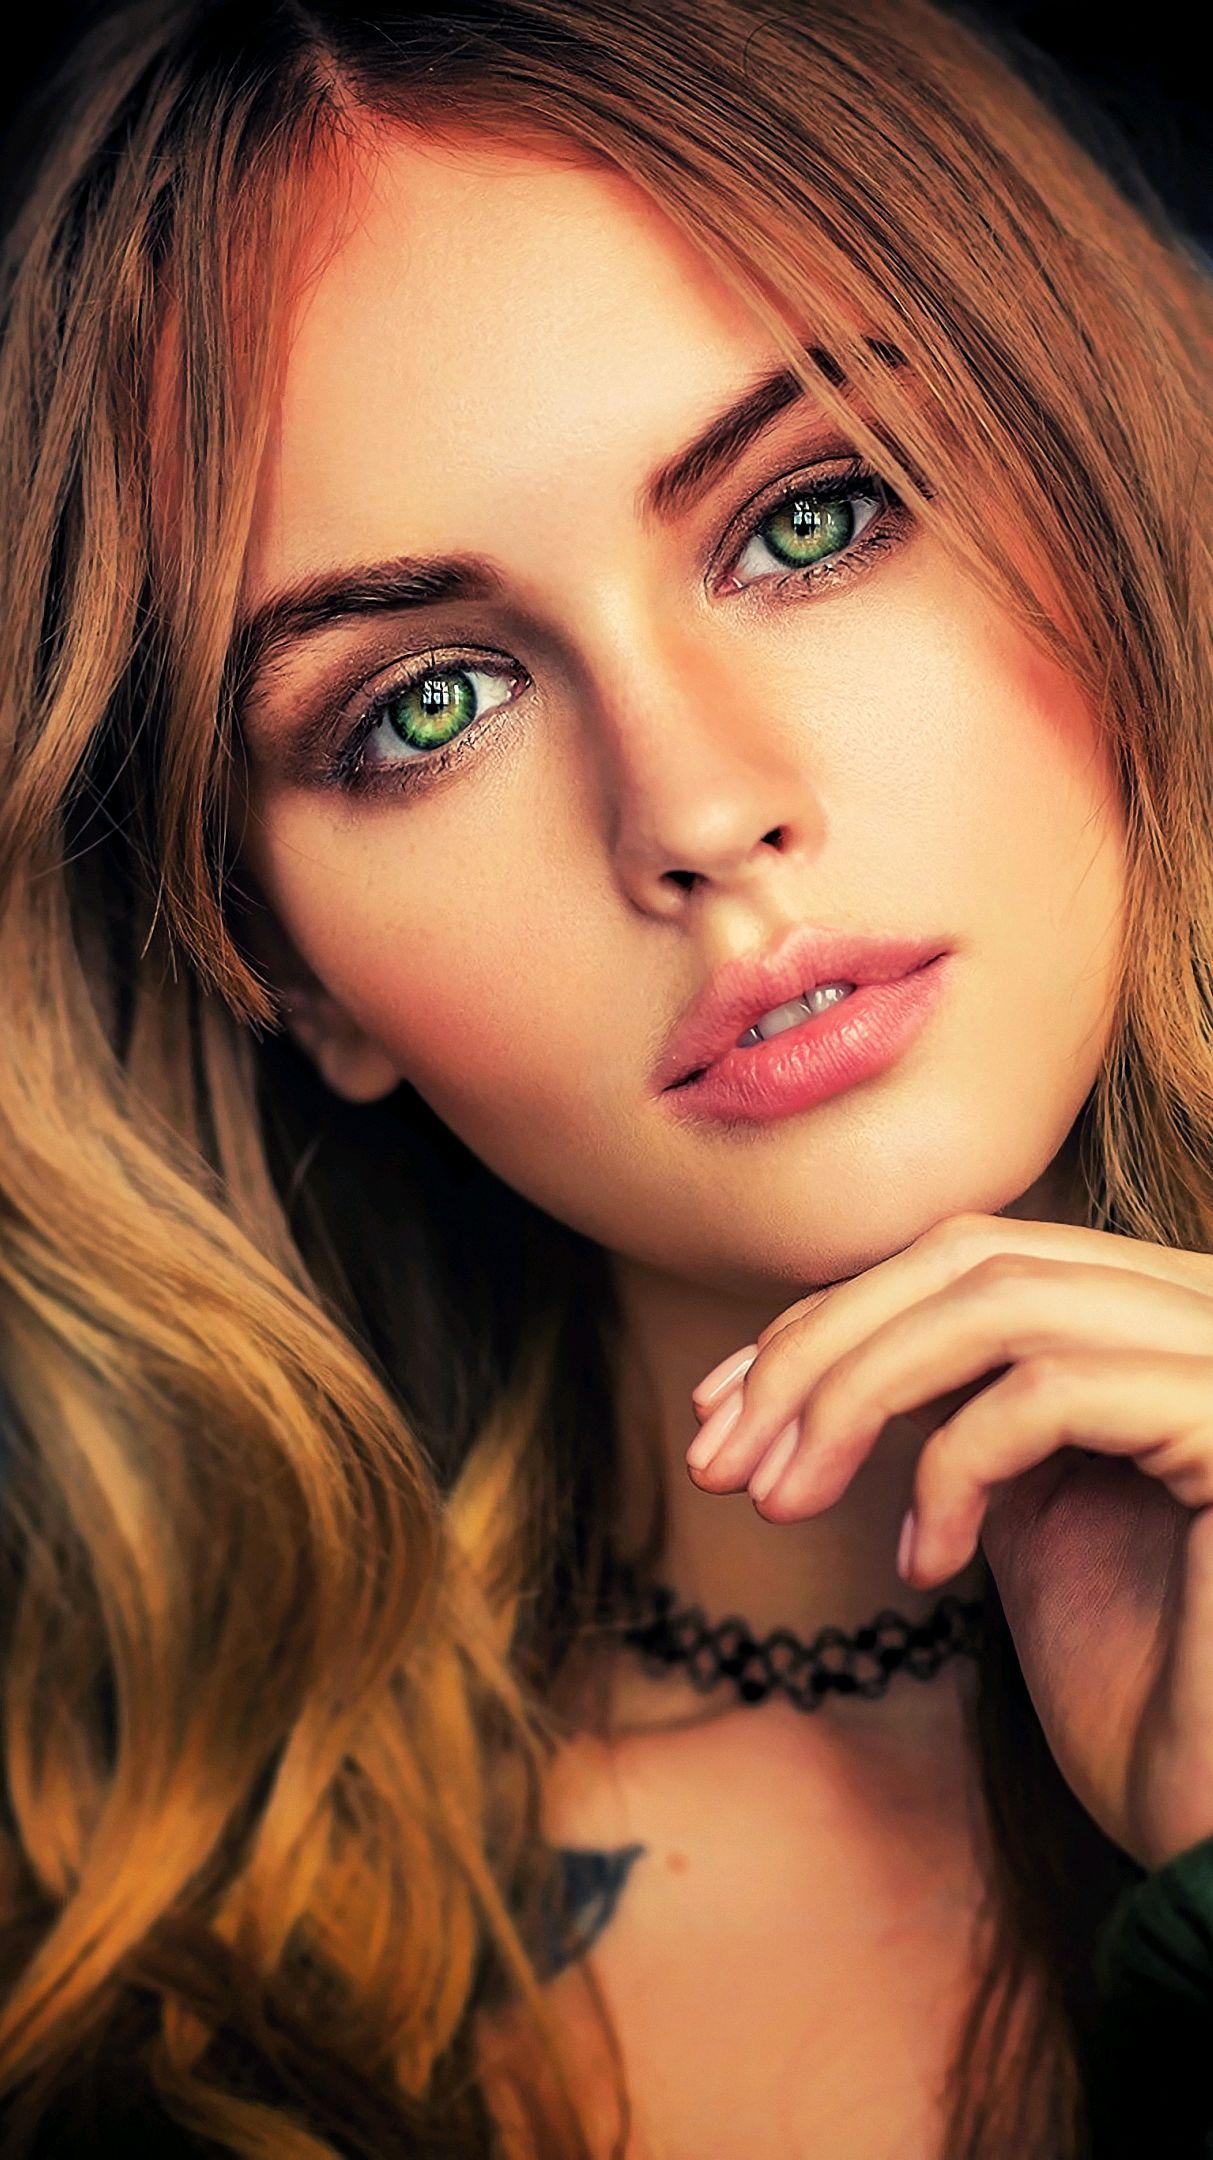 Cute Girly Iphone 6 Wallpaper Anastasia Scheglova Beautiful Face Girl Eyes Iphone